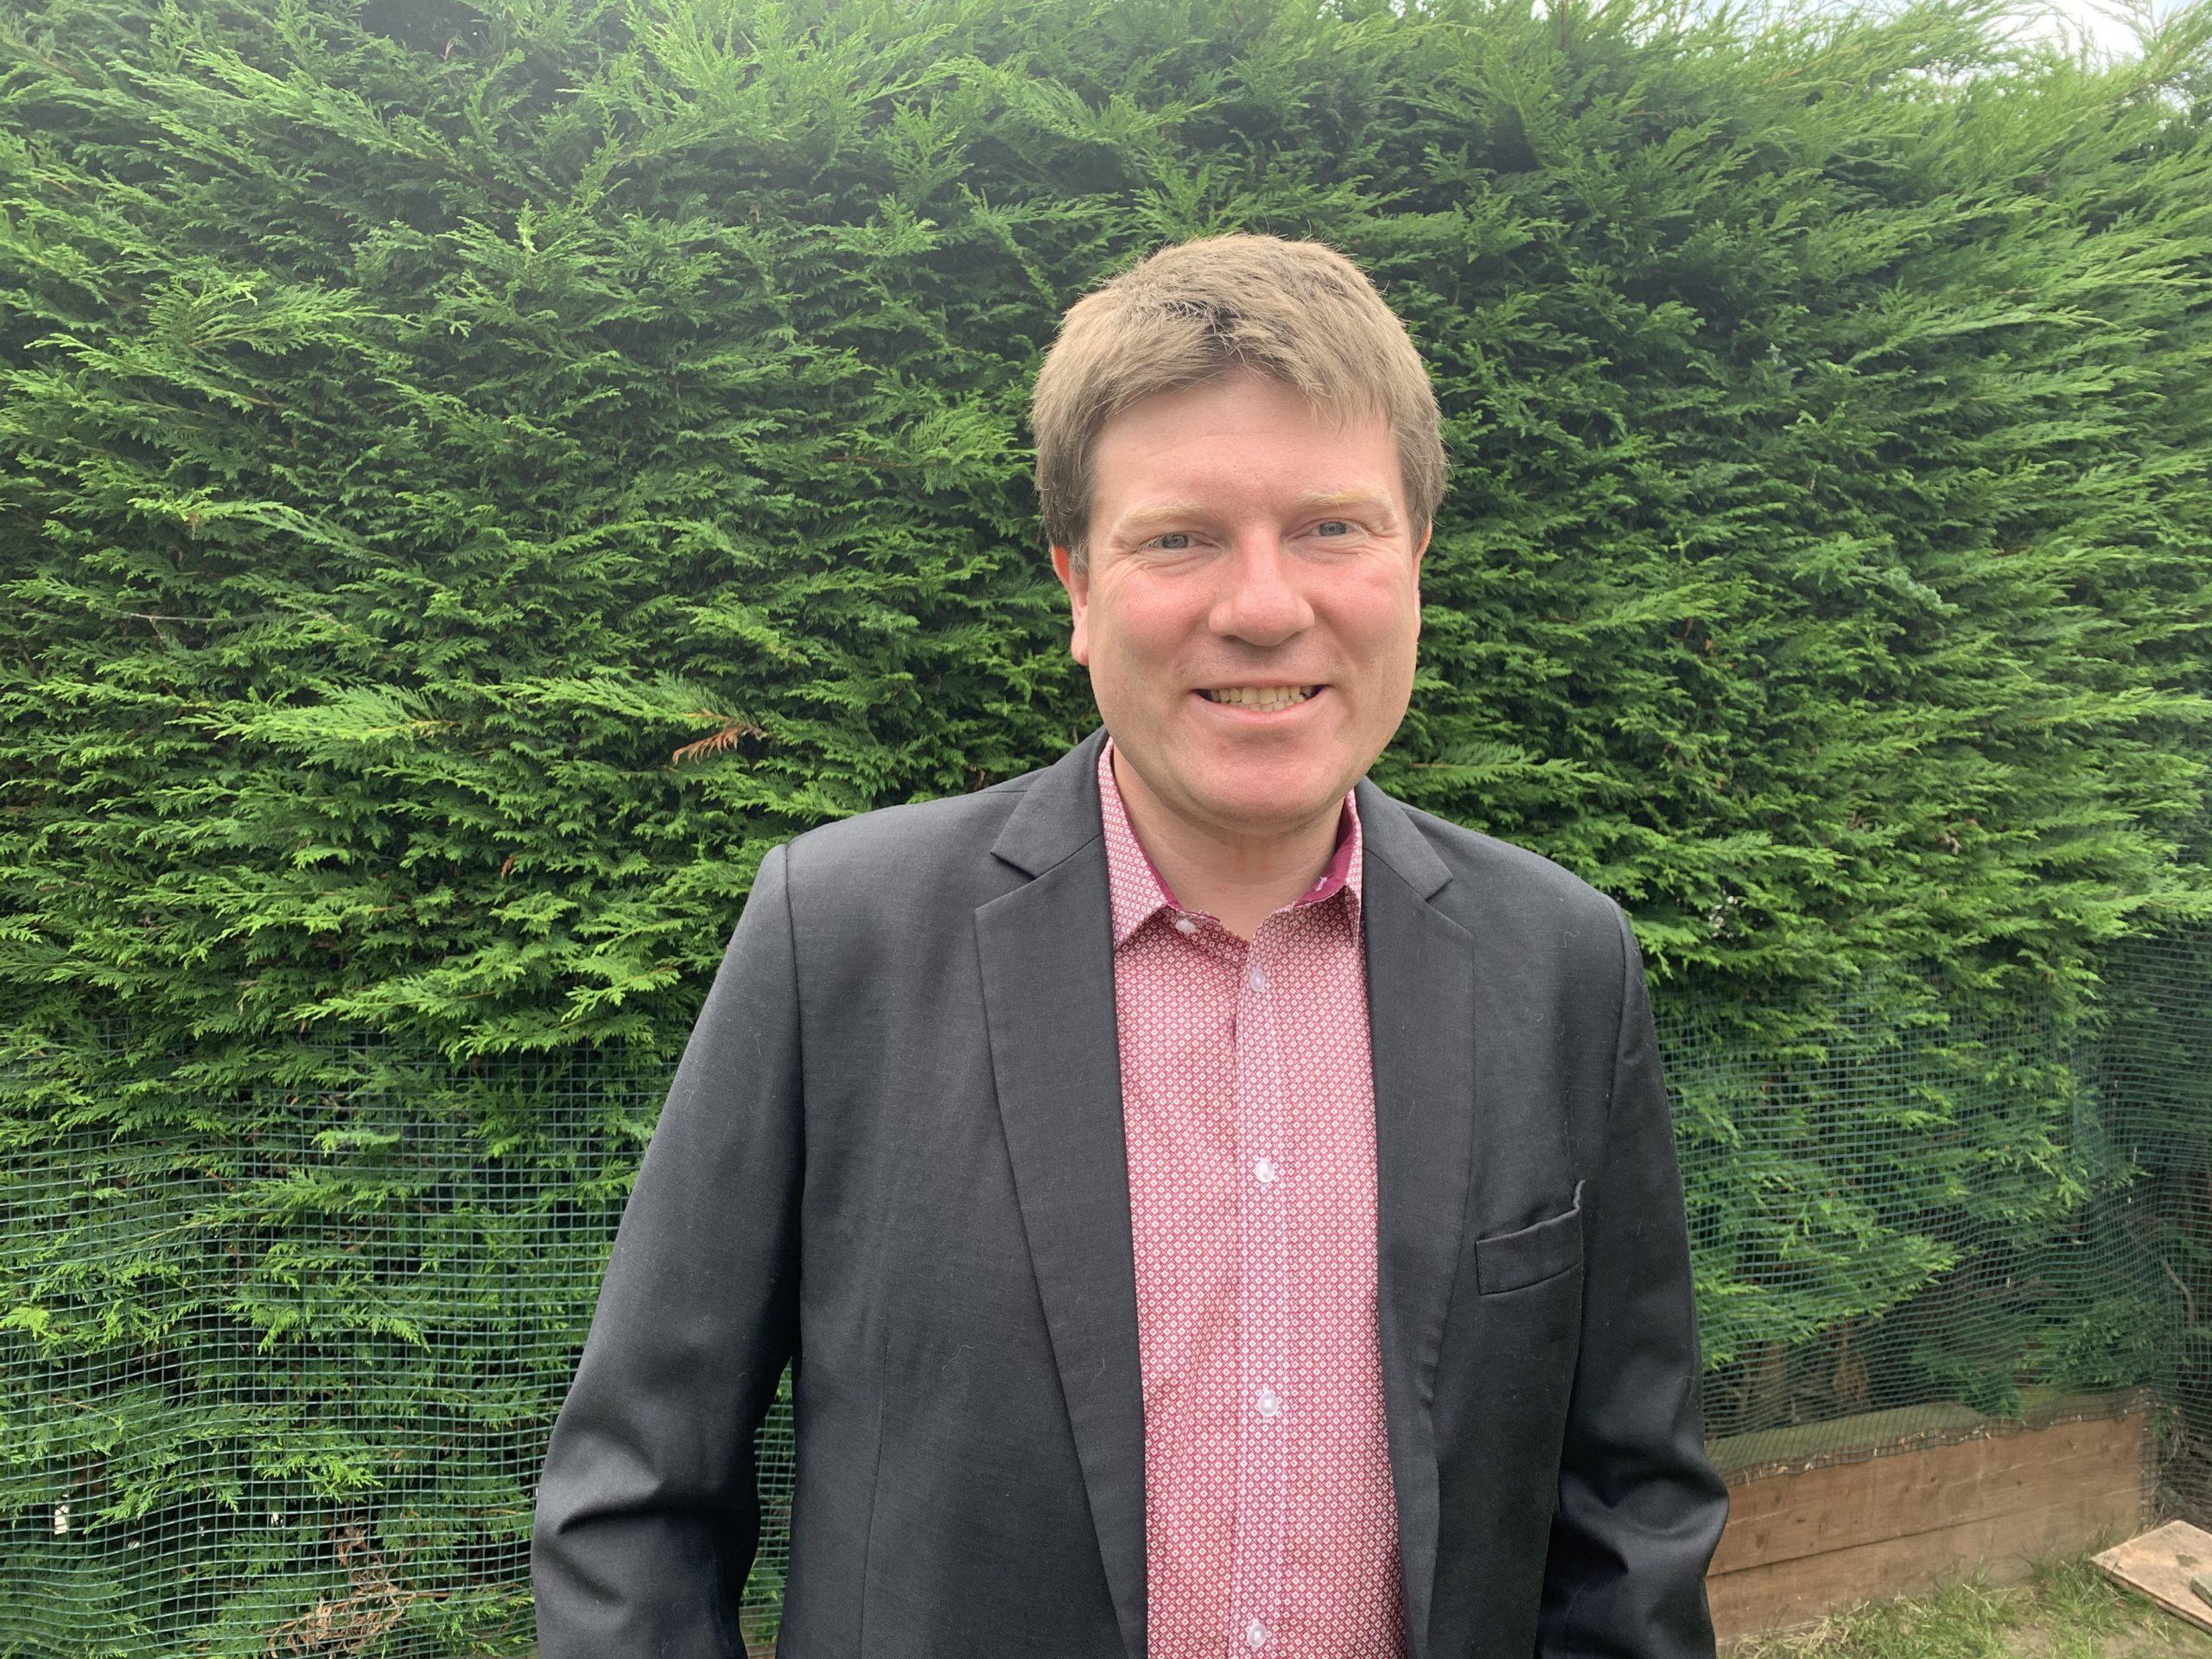 James Calder – Campaigning in Scotland